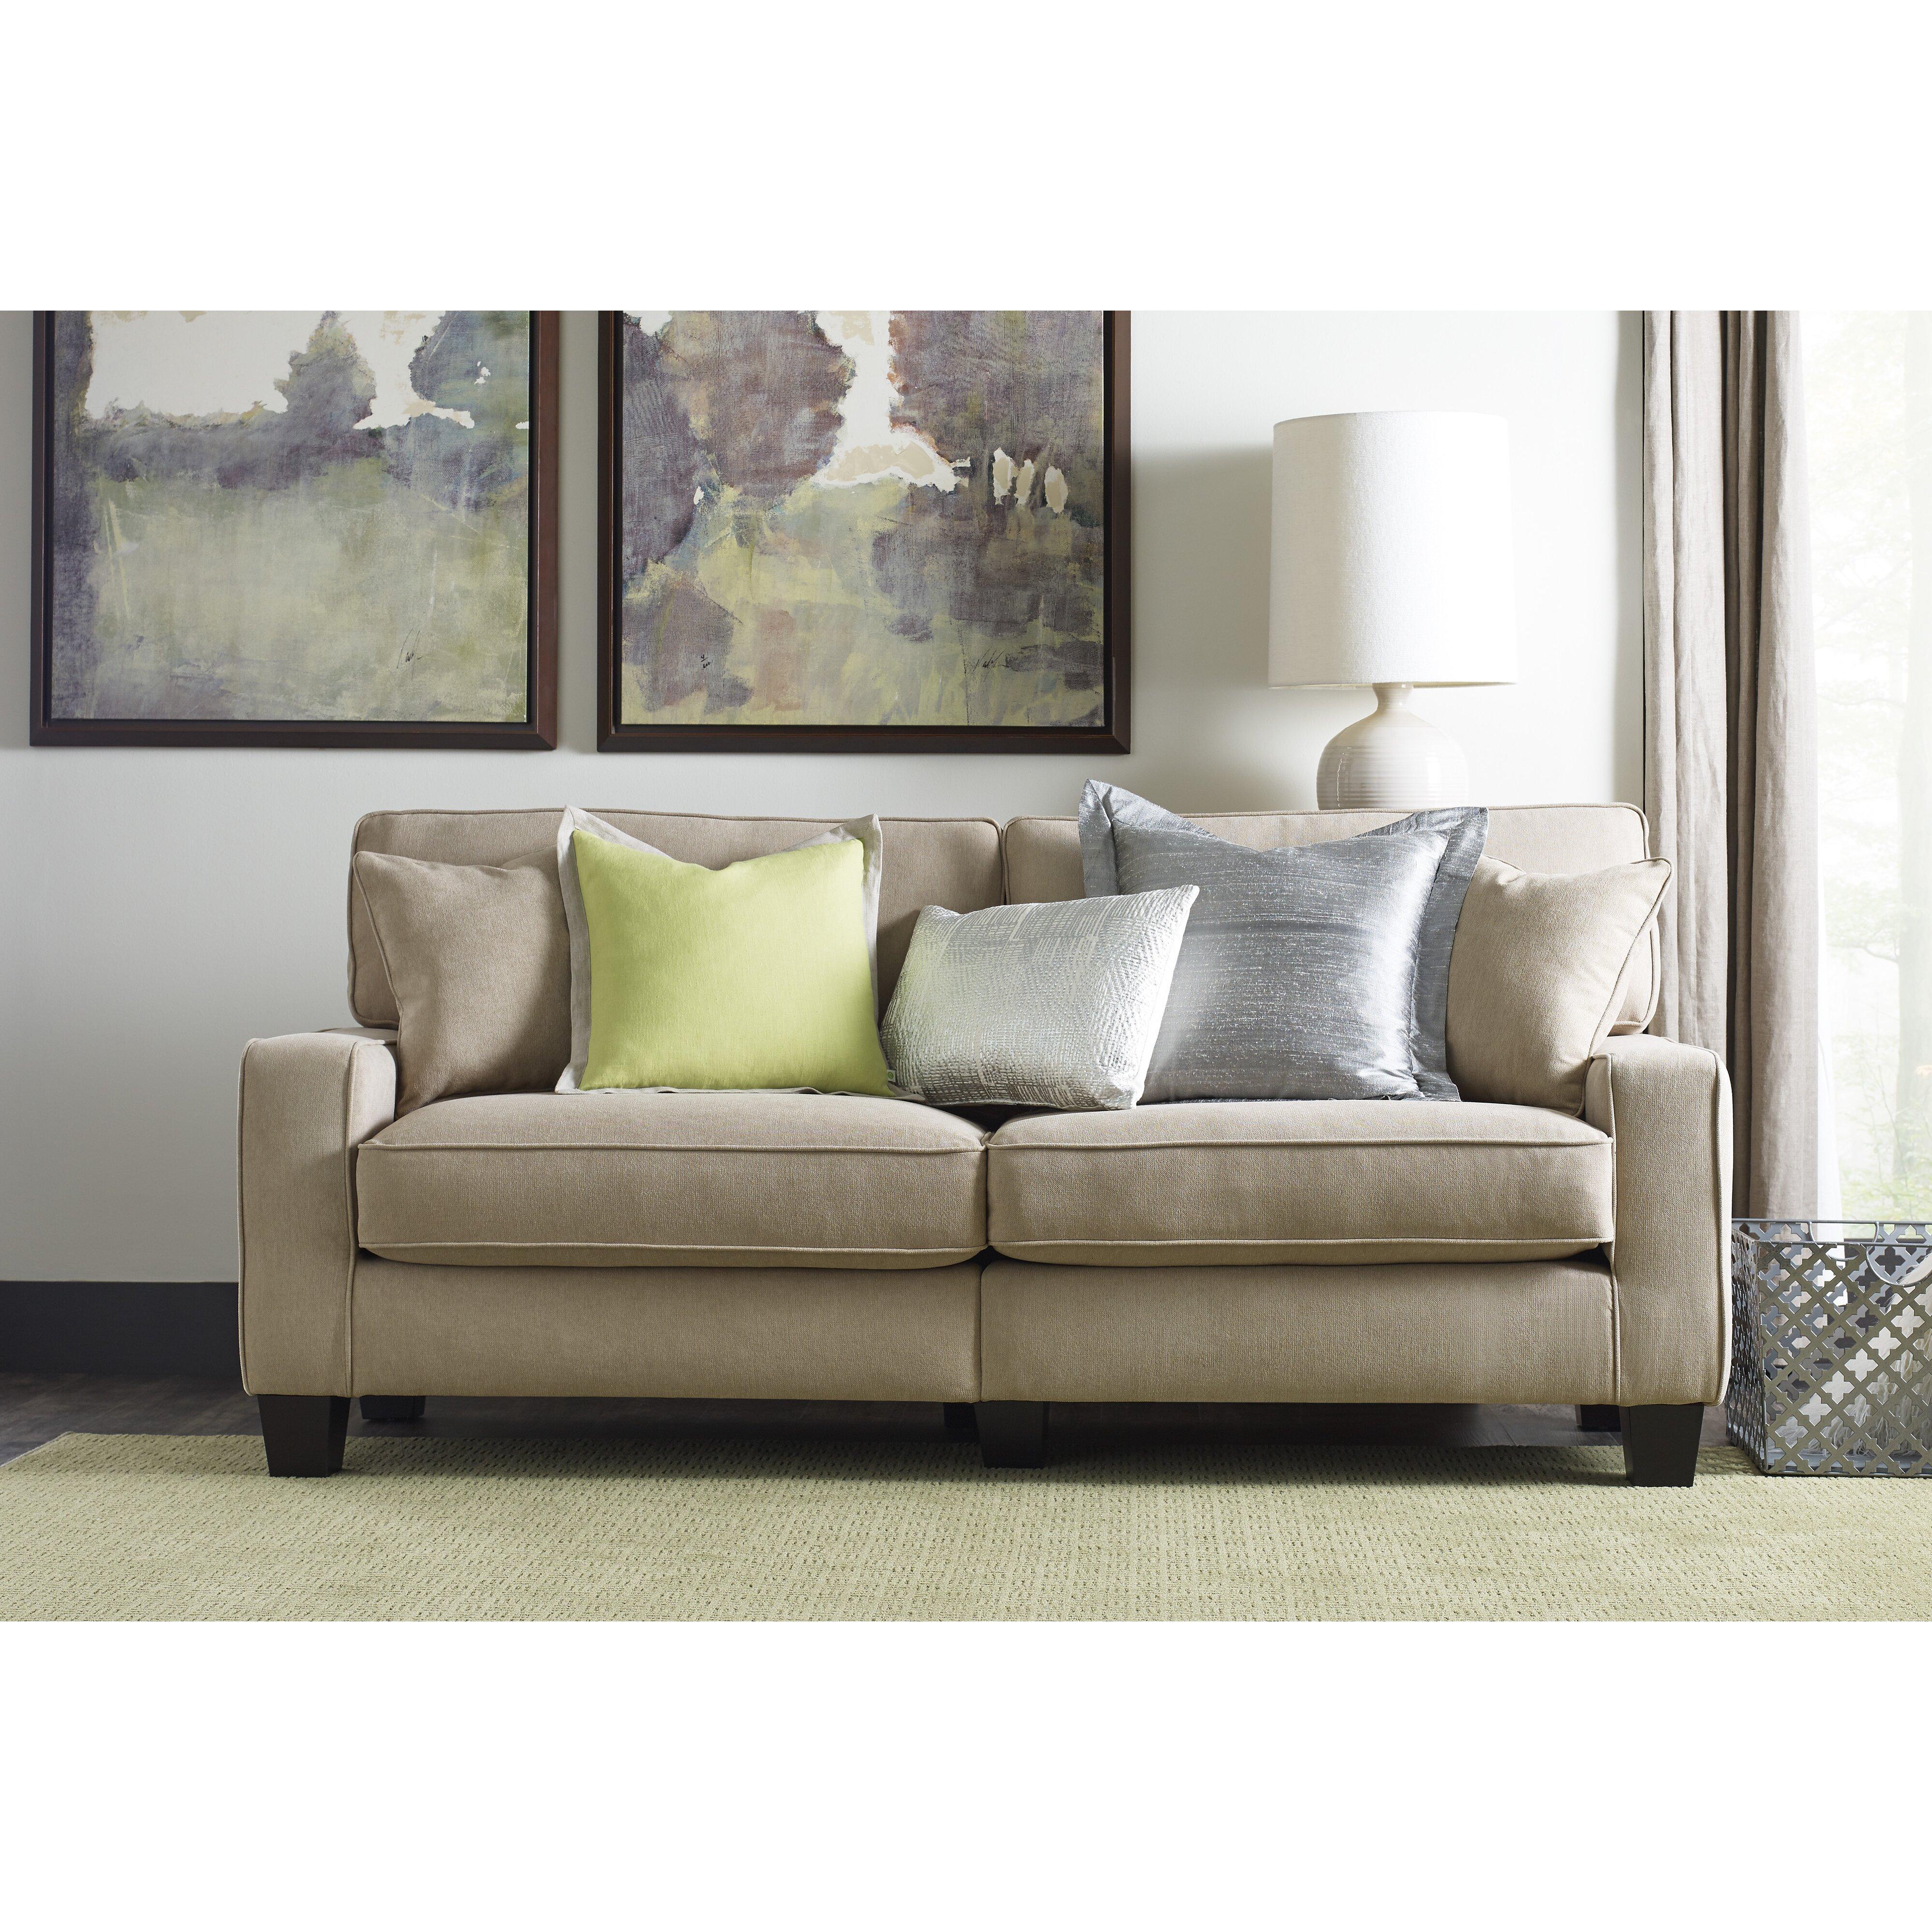 Wayfair Living Room Furniture Serta At Home Palisades 73 Sofa Reviews Wayfair